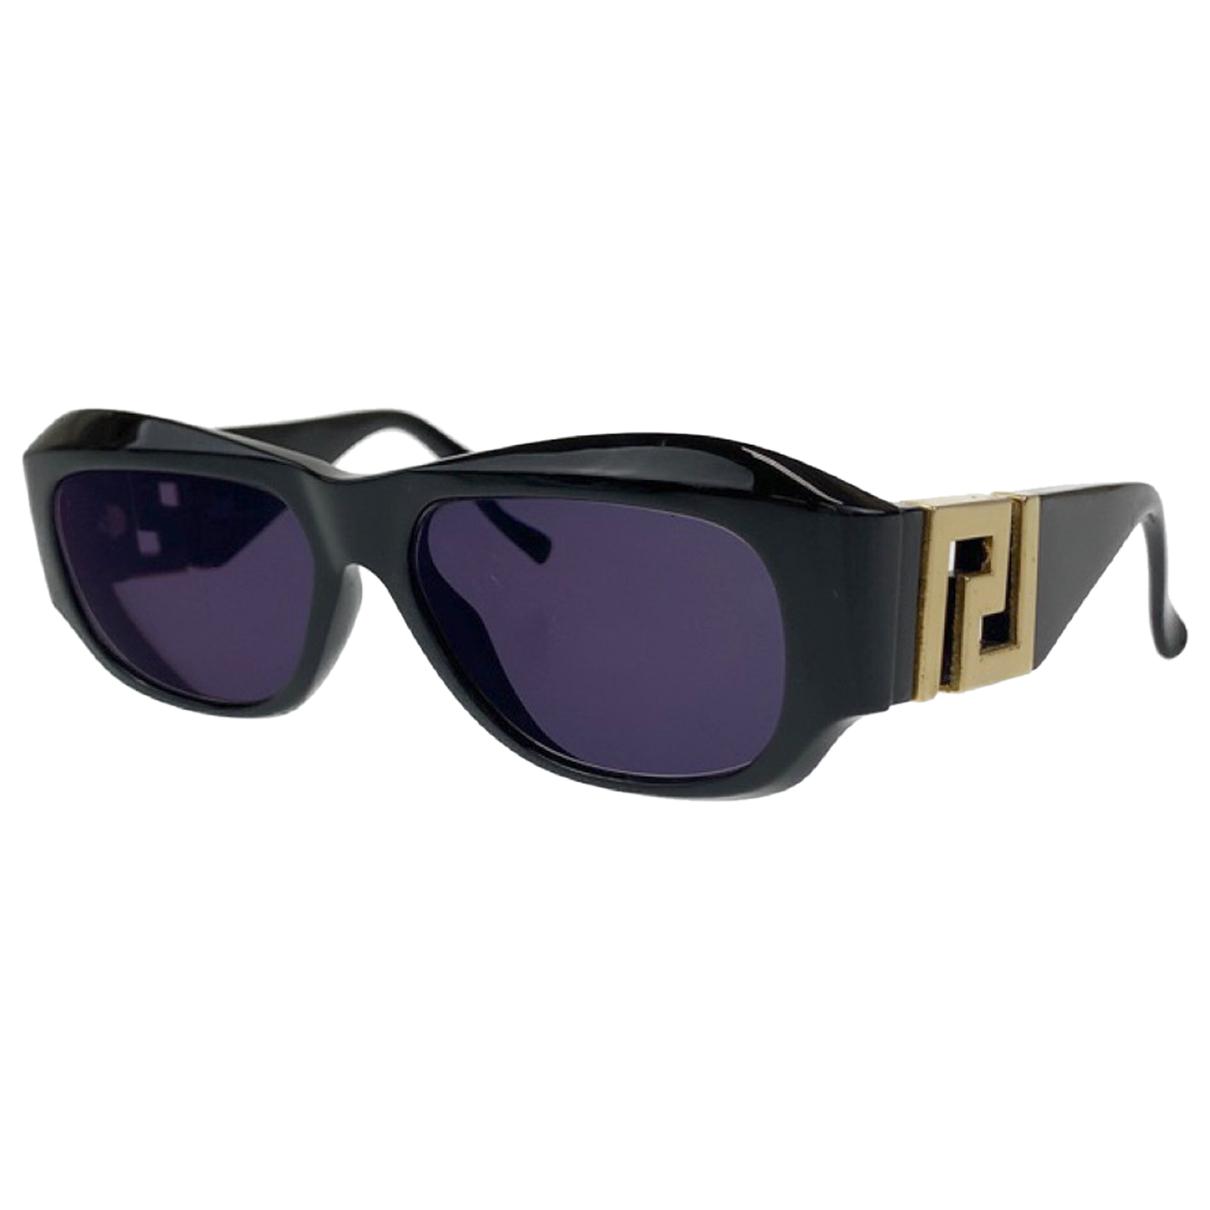 Gianni Versace N Sunglasses for Men N